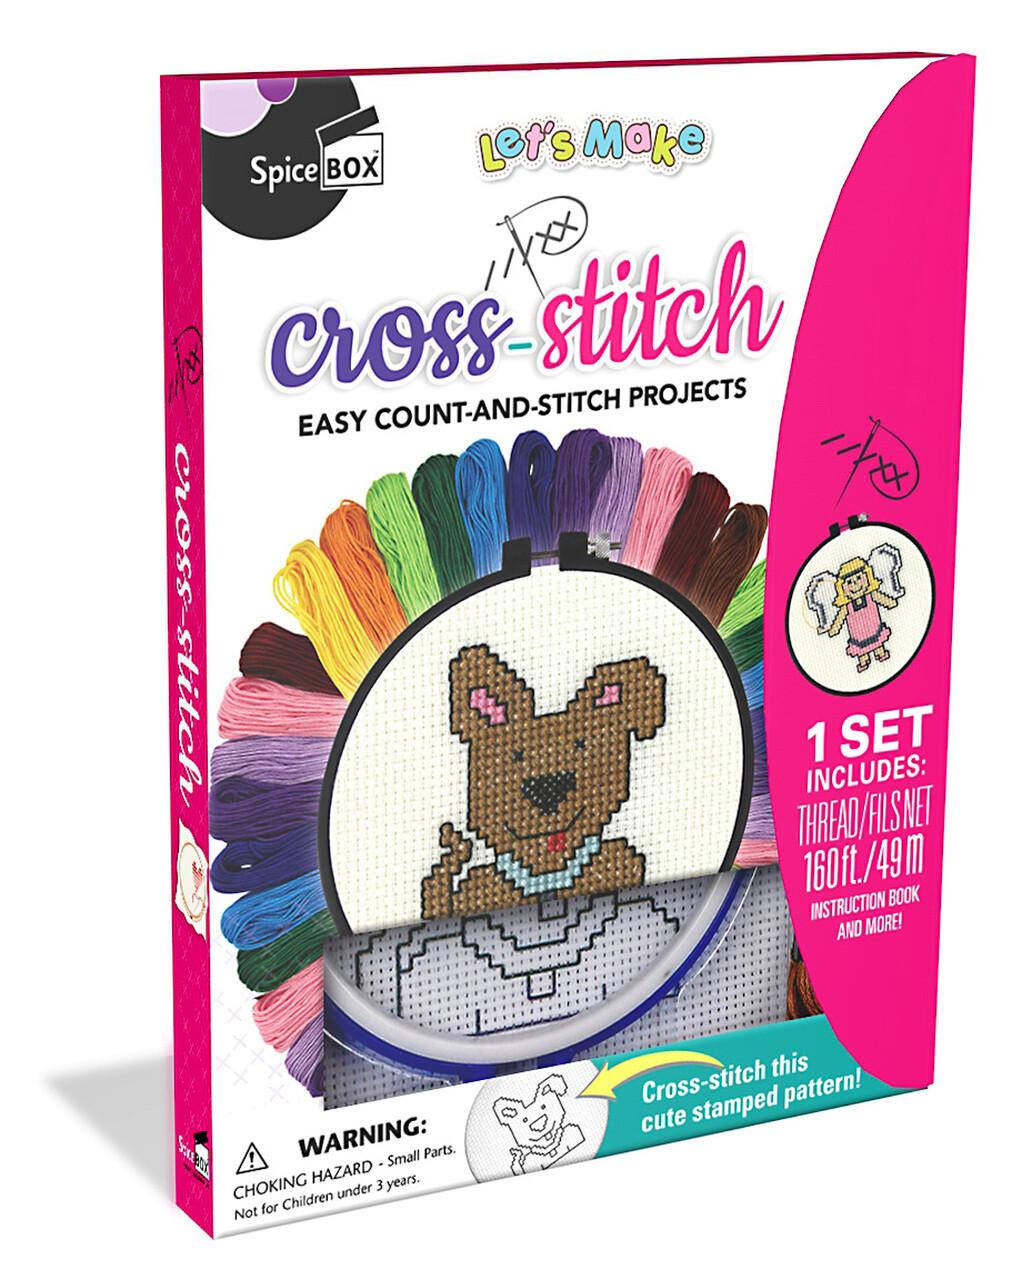 Spice Box; Cross-Stitch